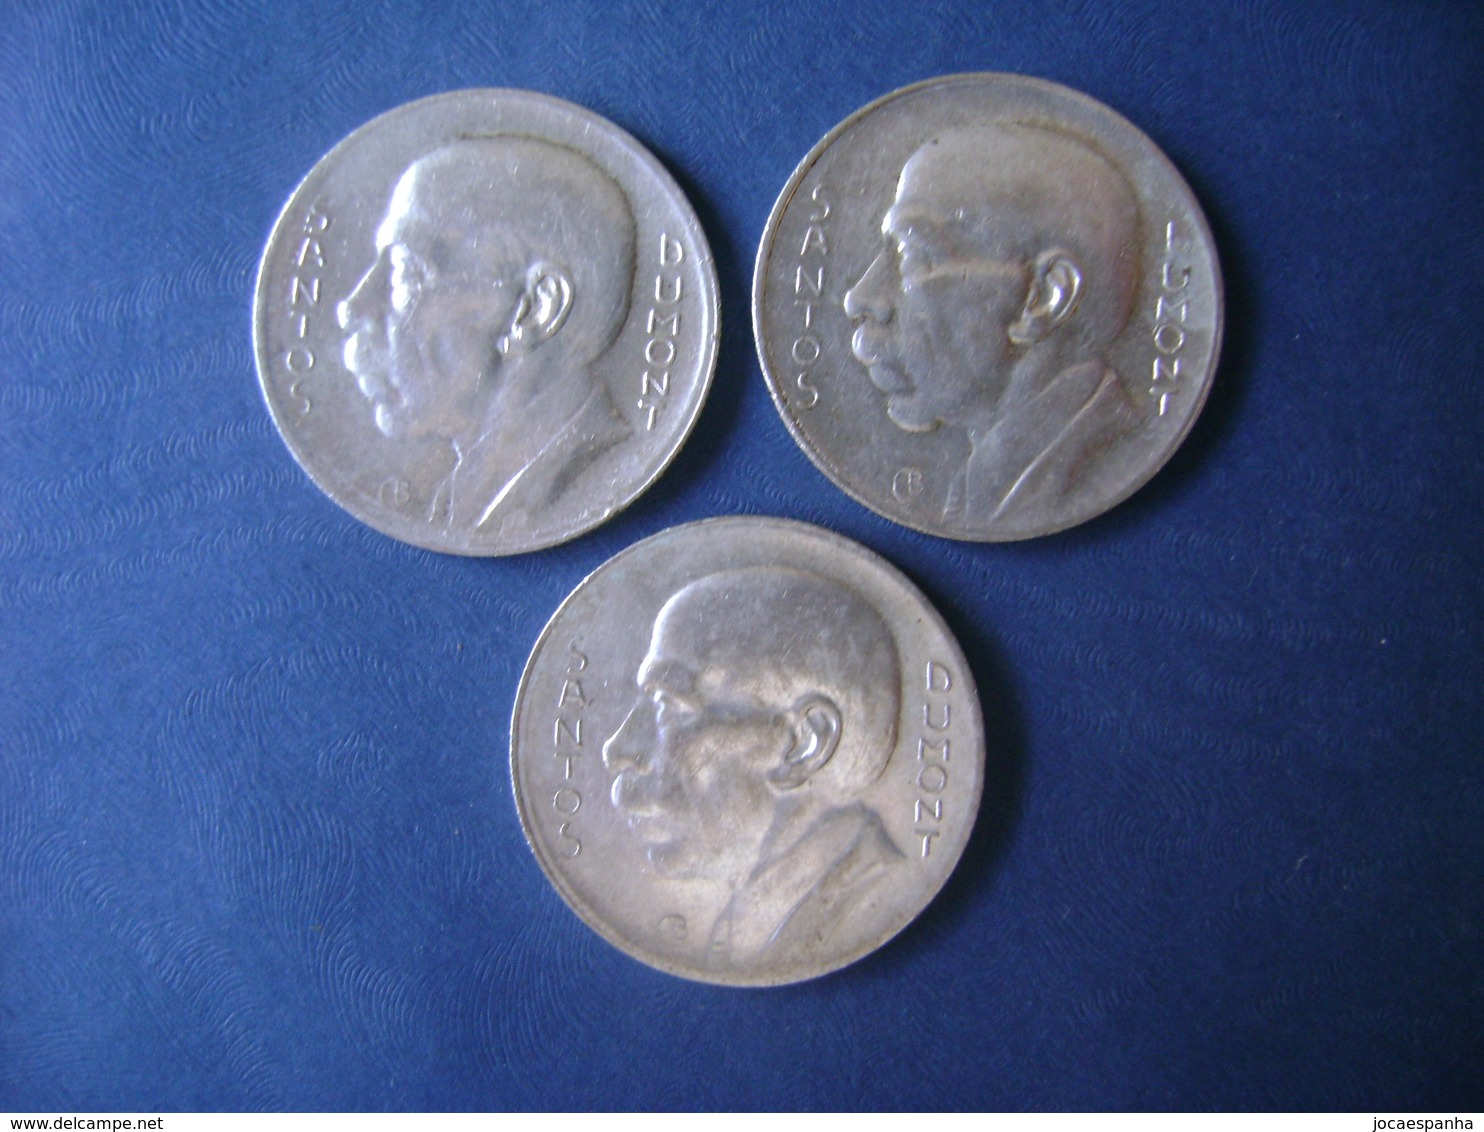 "BRAZIL / BRASIL - 3 COINS ""SANTOS DUMONT"", SILVER / PRATA , 1936, 1937 AND 1938 - Brésil"